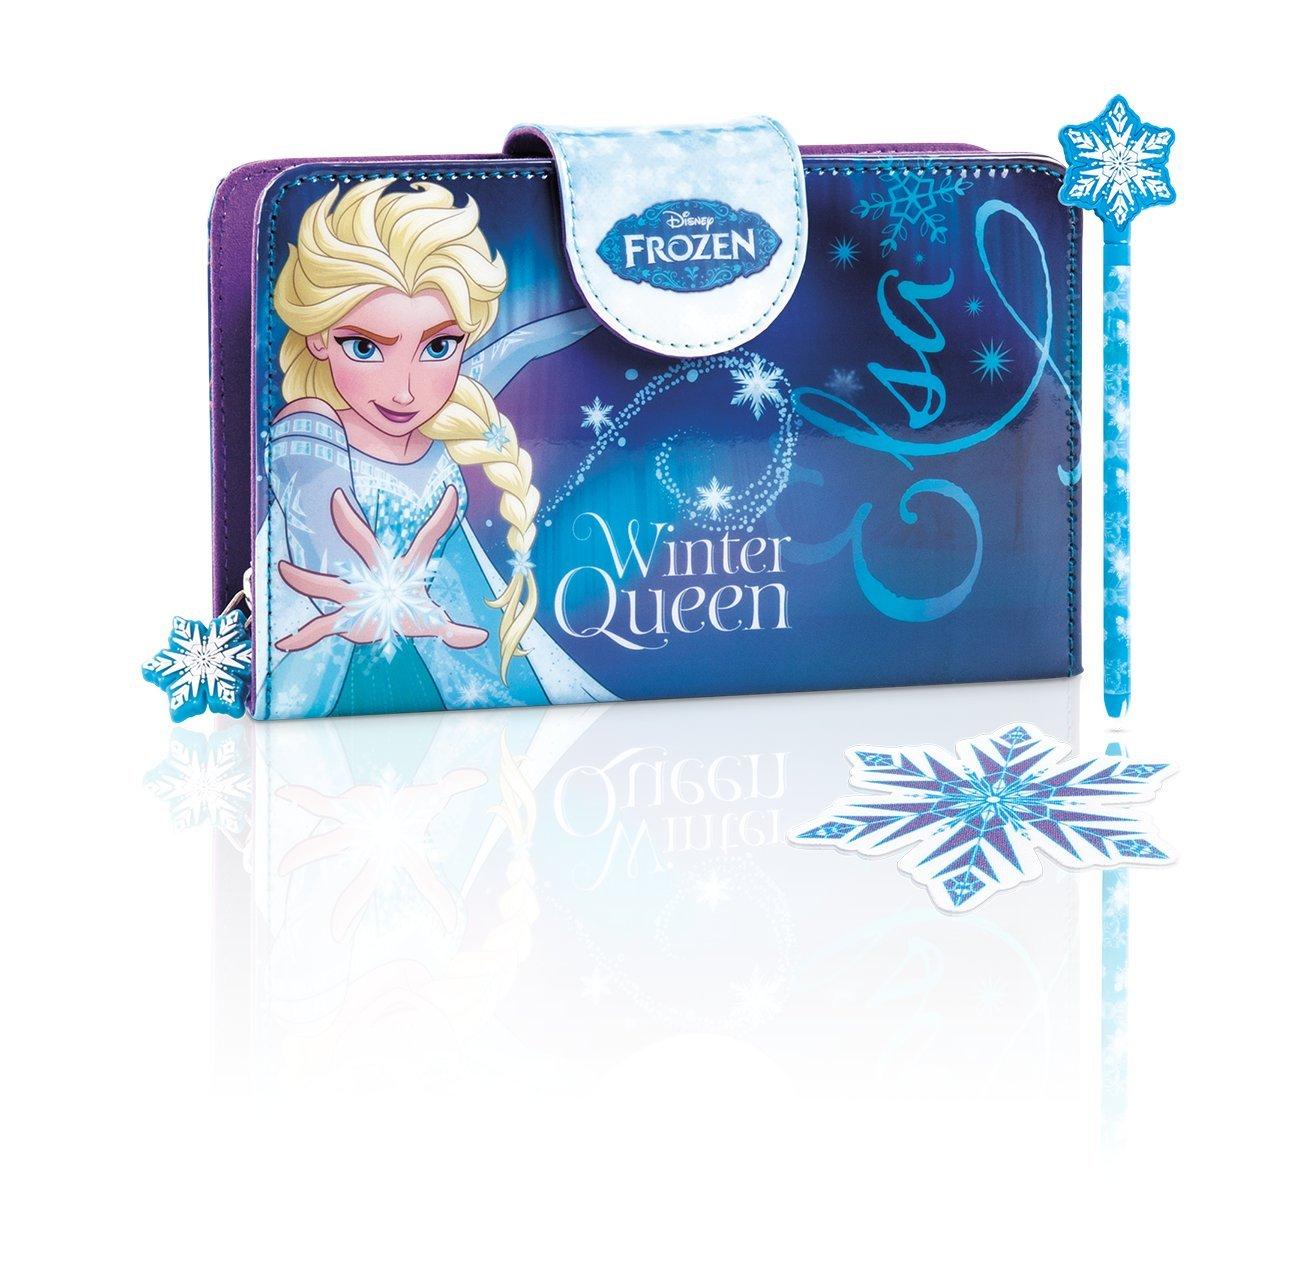 Funda Frozen Starter Kit (Nintendo 3DS, 3DS XL y New 3DS) PLUS